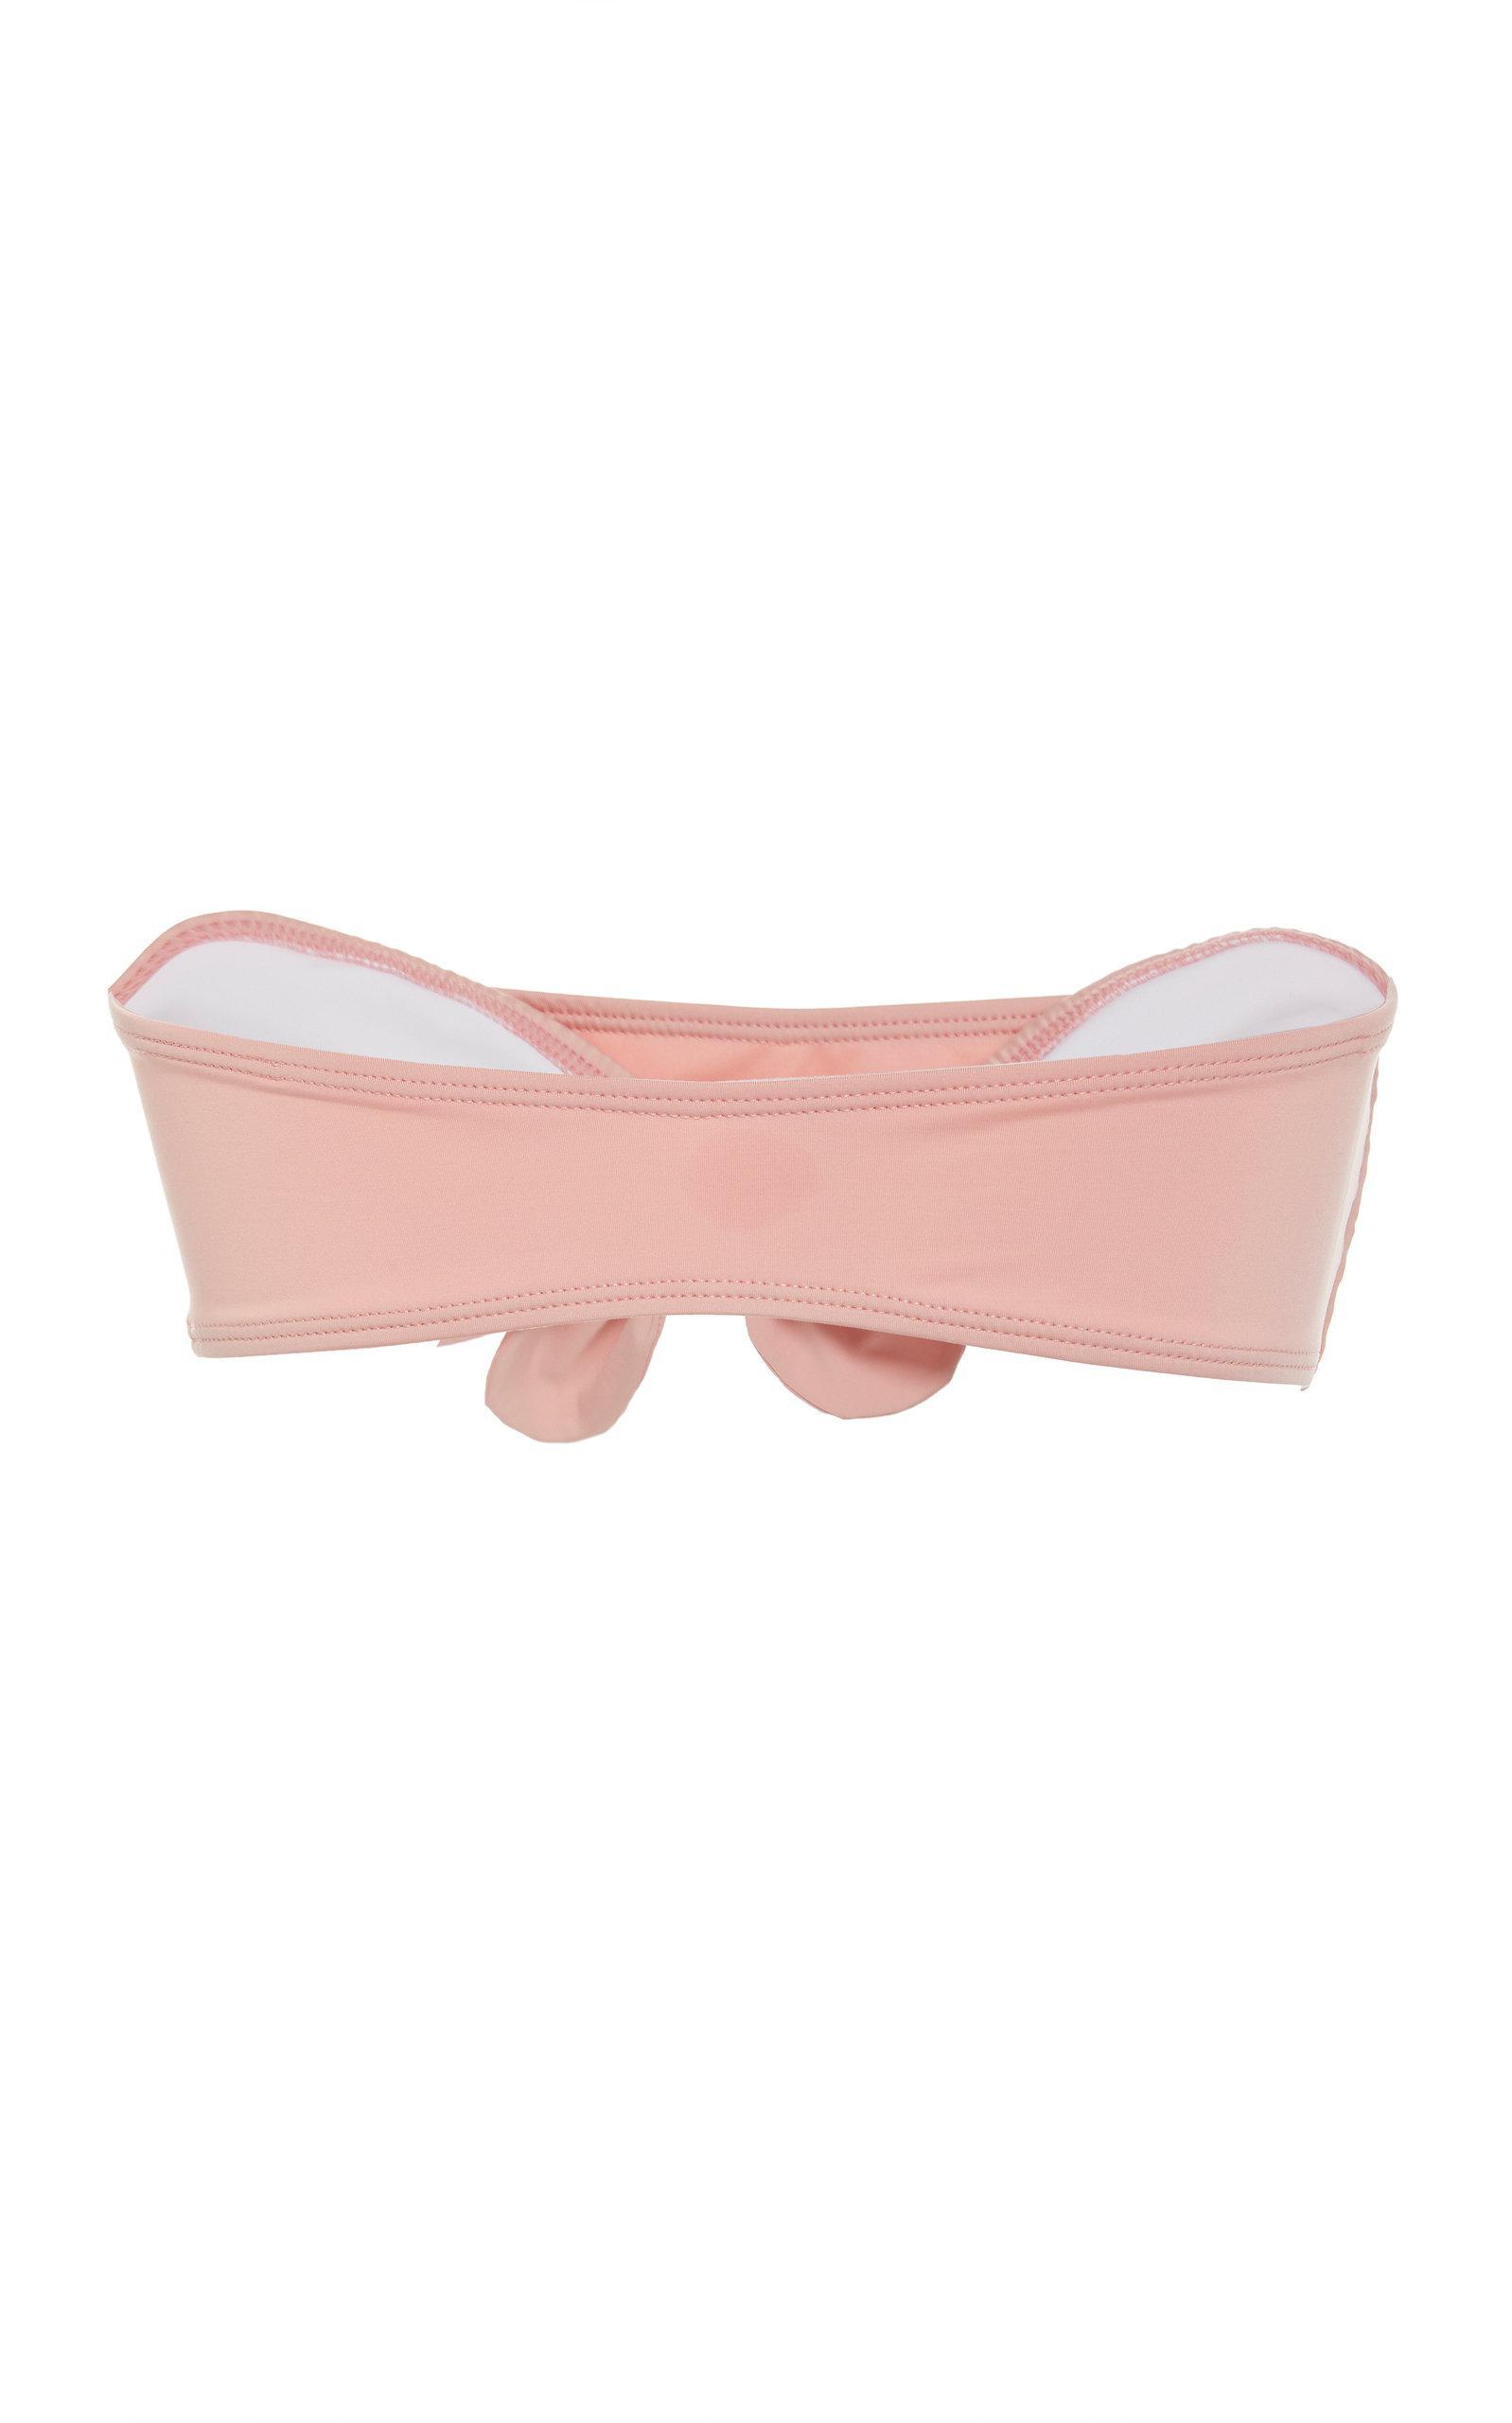 d264ce93e8eaa ... Pink Malibu Bandeau Bikini Top - Lyst. View fullscreen